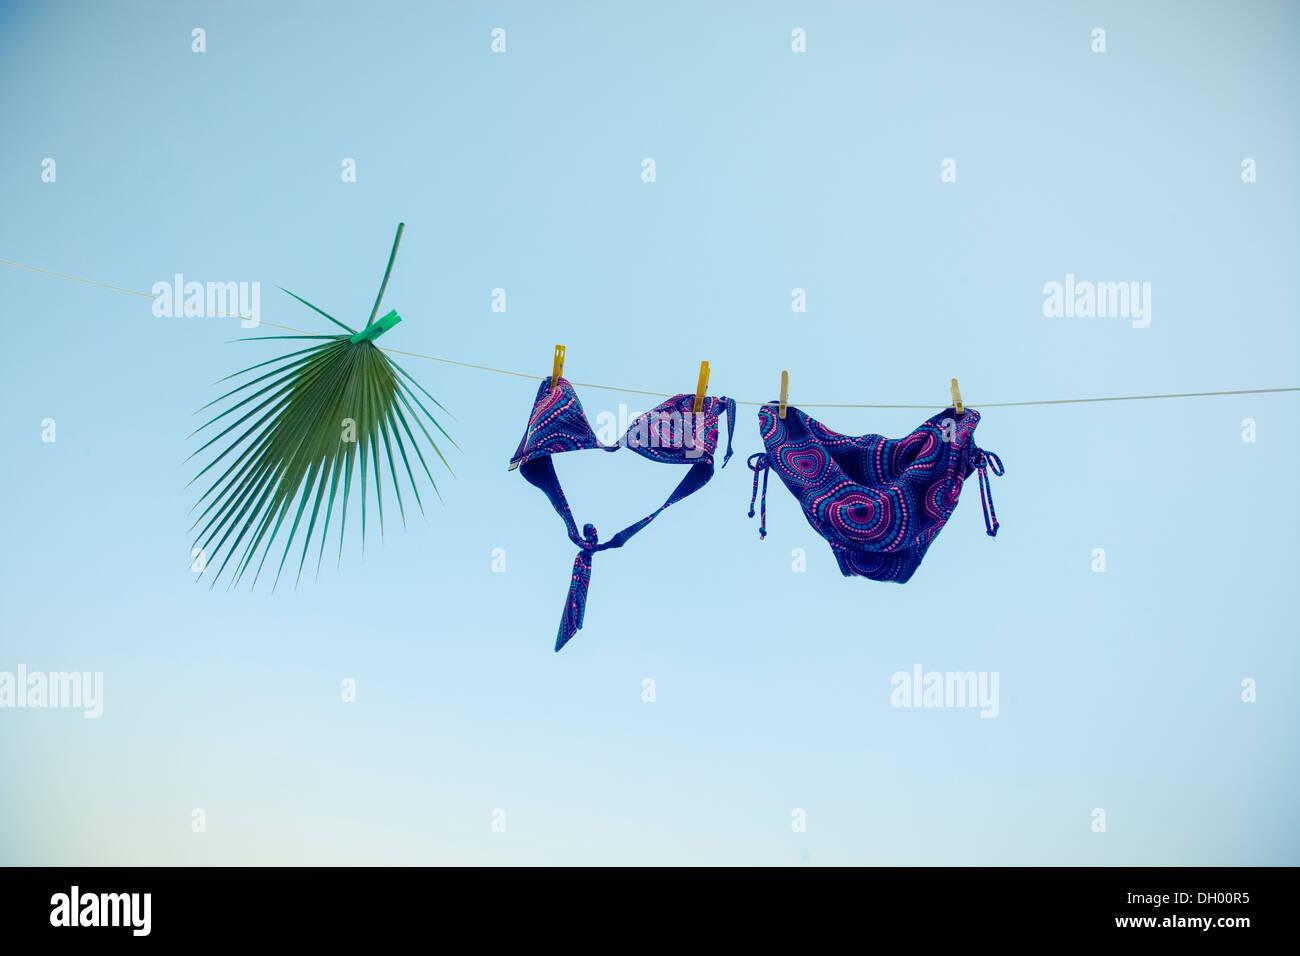 a-bikini-and-fan-palm-leaf-on-a-washing-